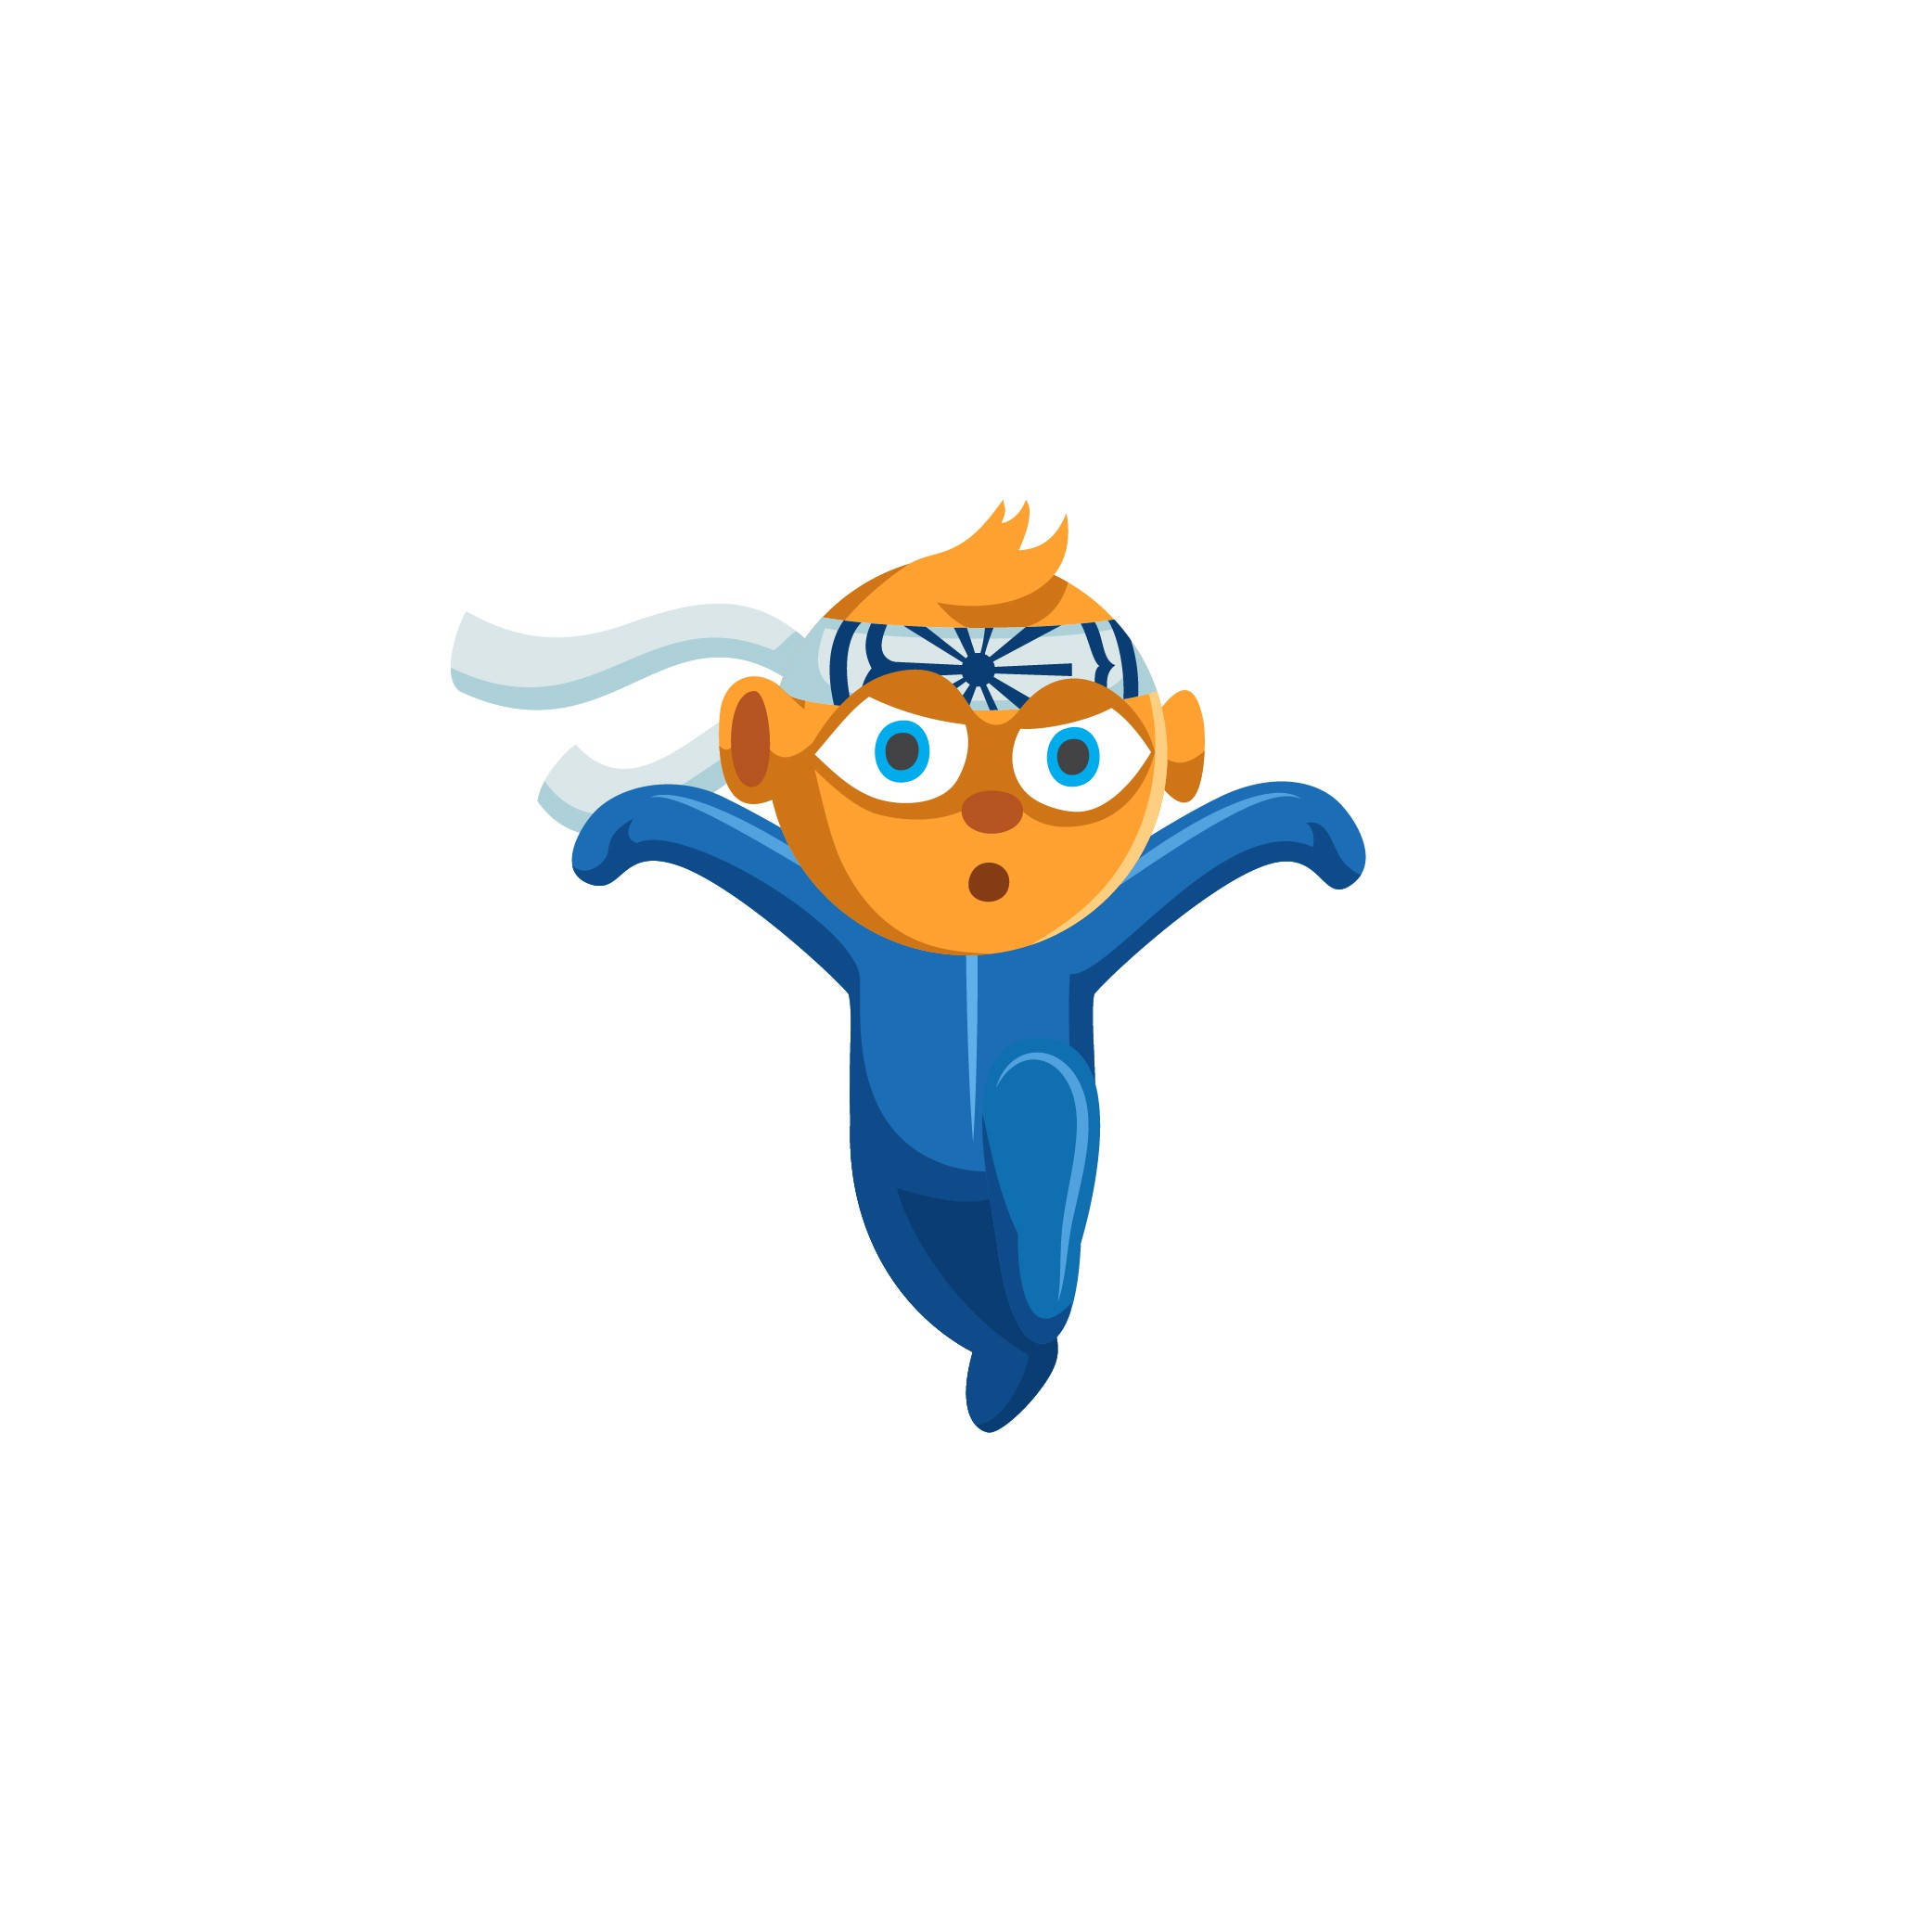 Mascot as karate kid